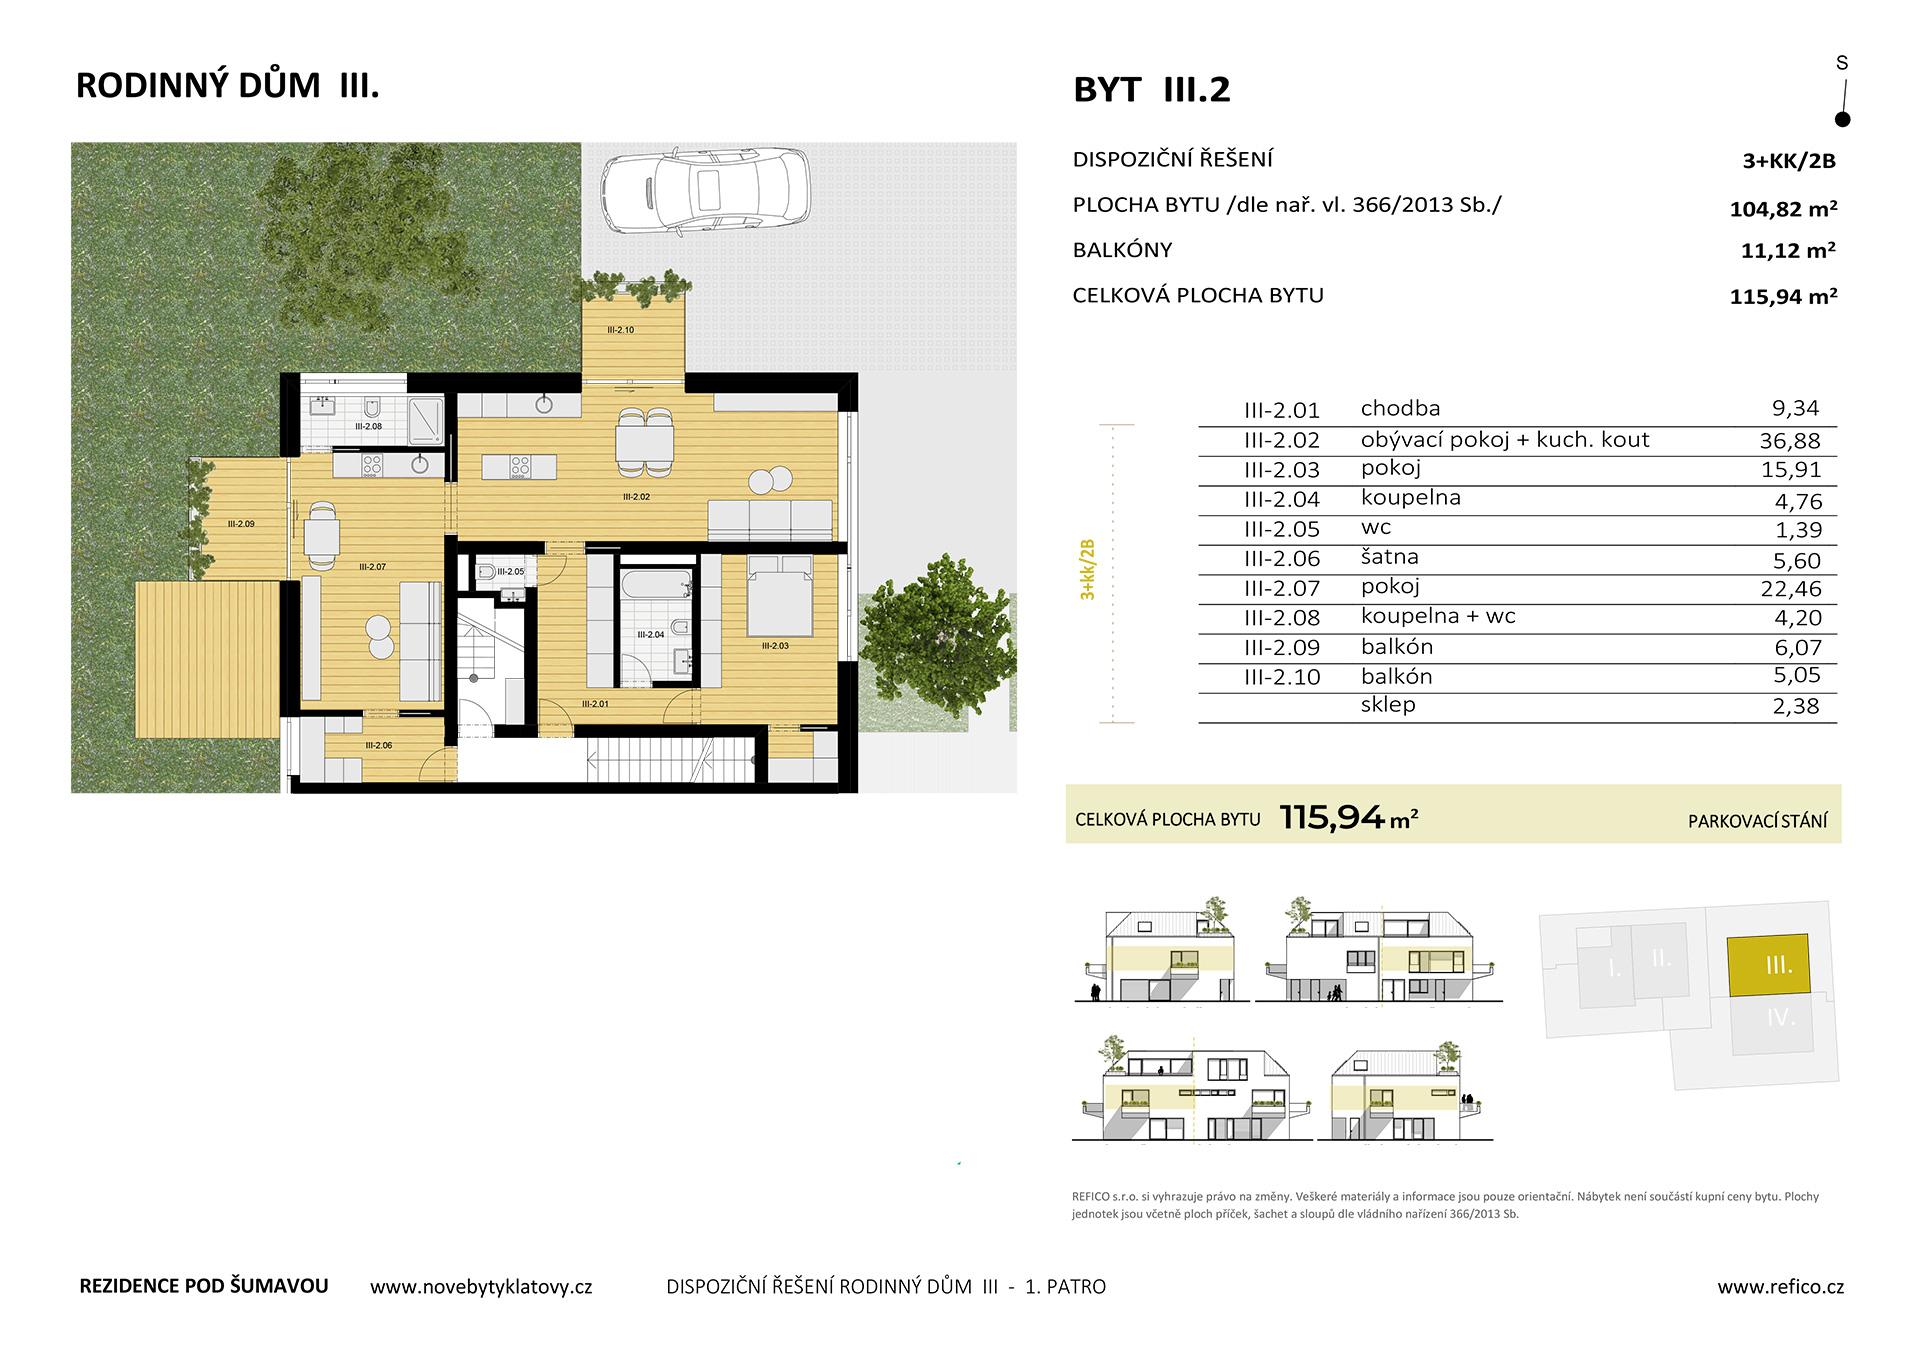 Dům III., byt 2, 1. patro, dvougenerační byt 3+KK/2B, alt. 2+KK/B + garsoniéra/B